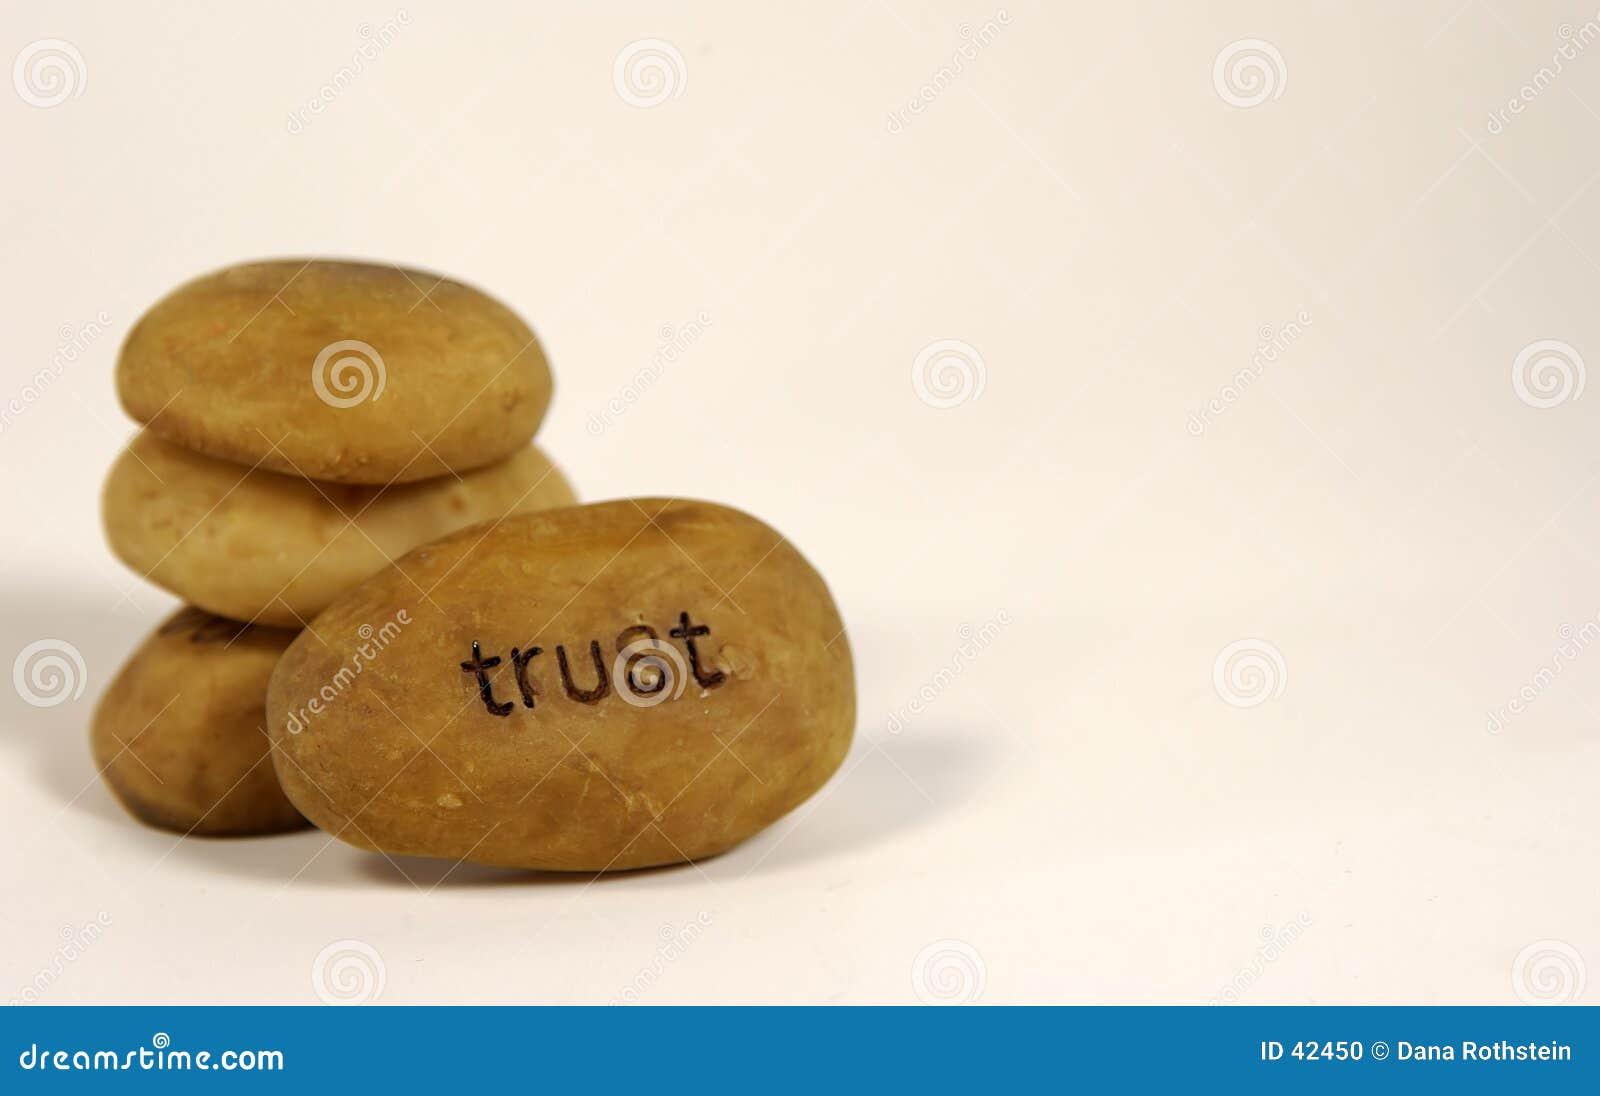 Vertrauens-Fossil